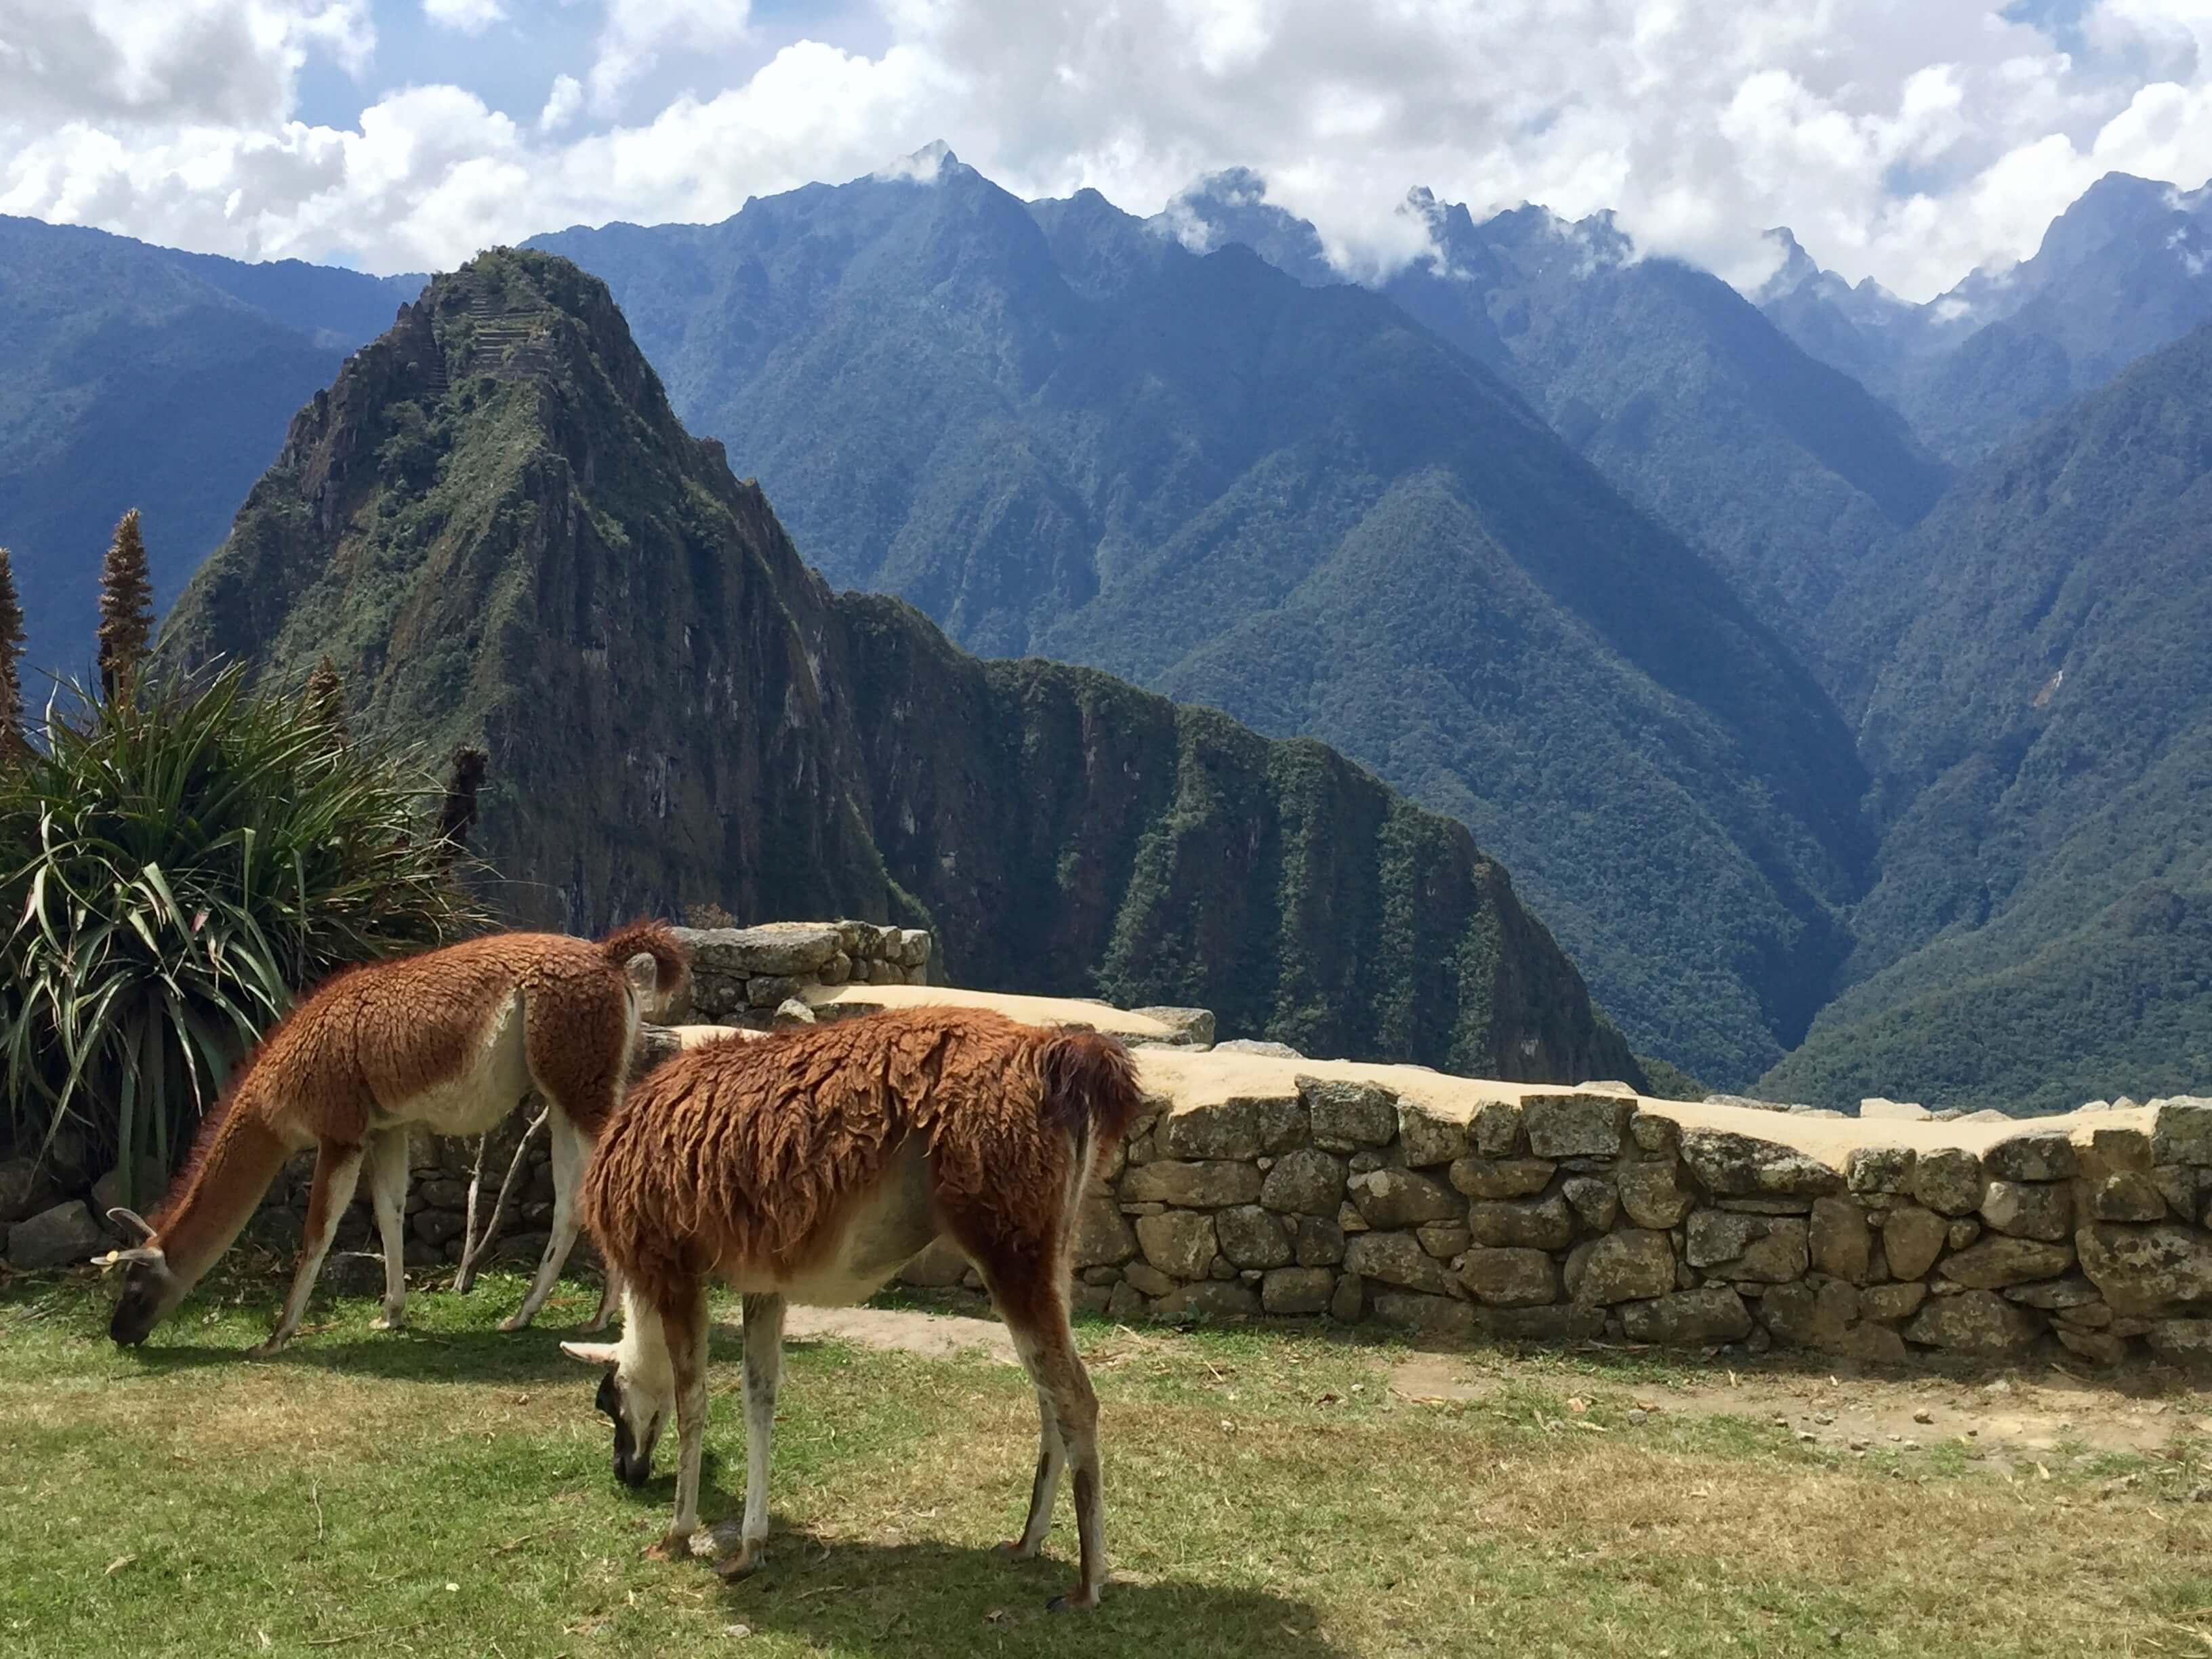 blog-10-facts-machu-picchu-llamas